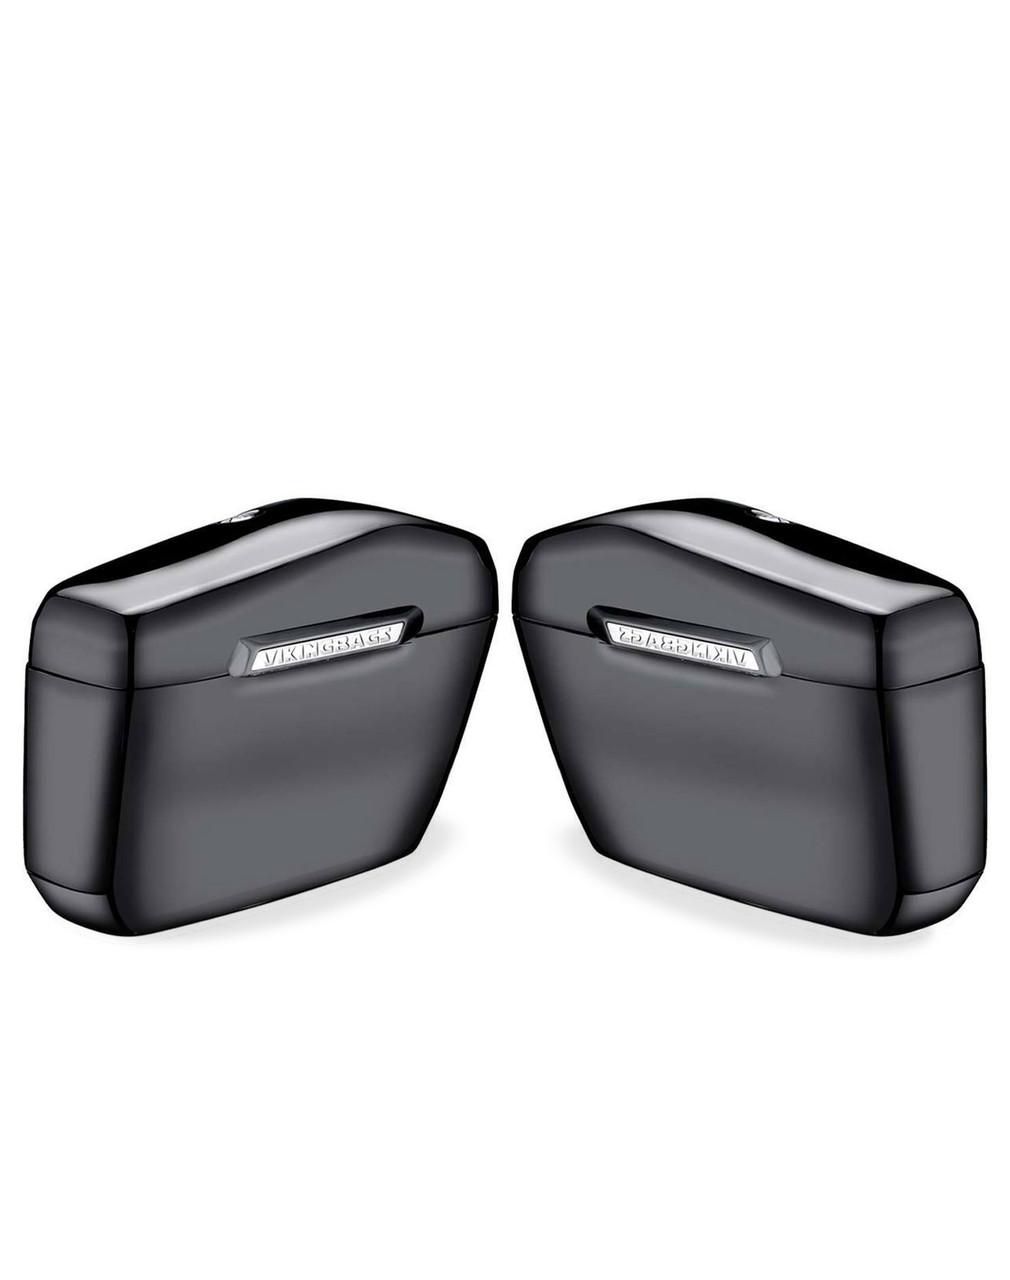 Honda VTX 1800 N Viking Lamellar Large Black Hard Saddlebags Both Bags View